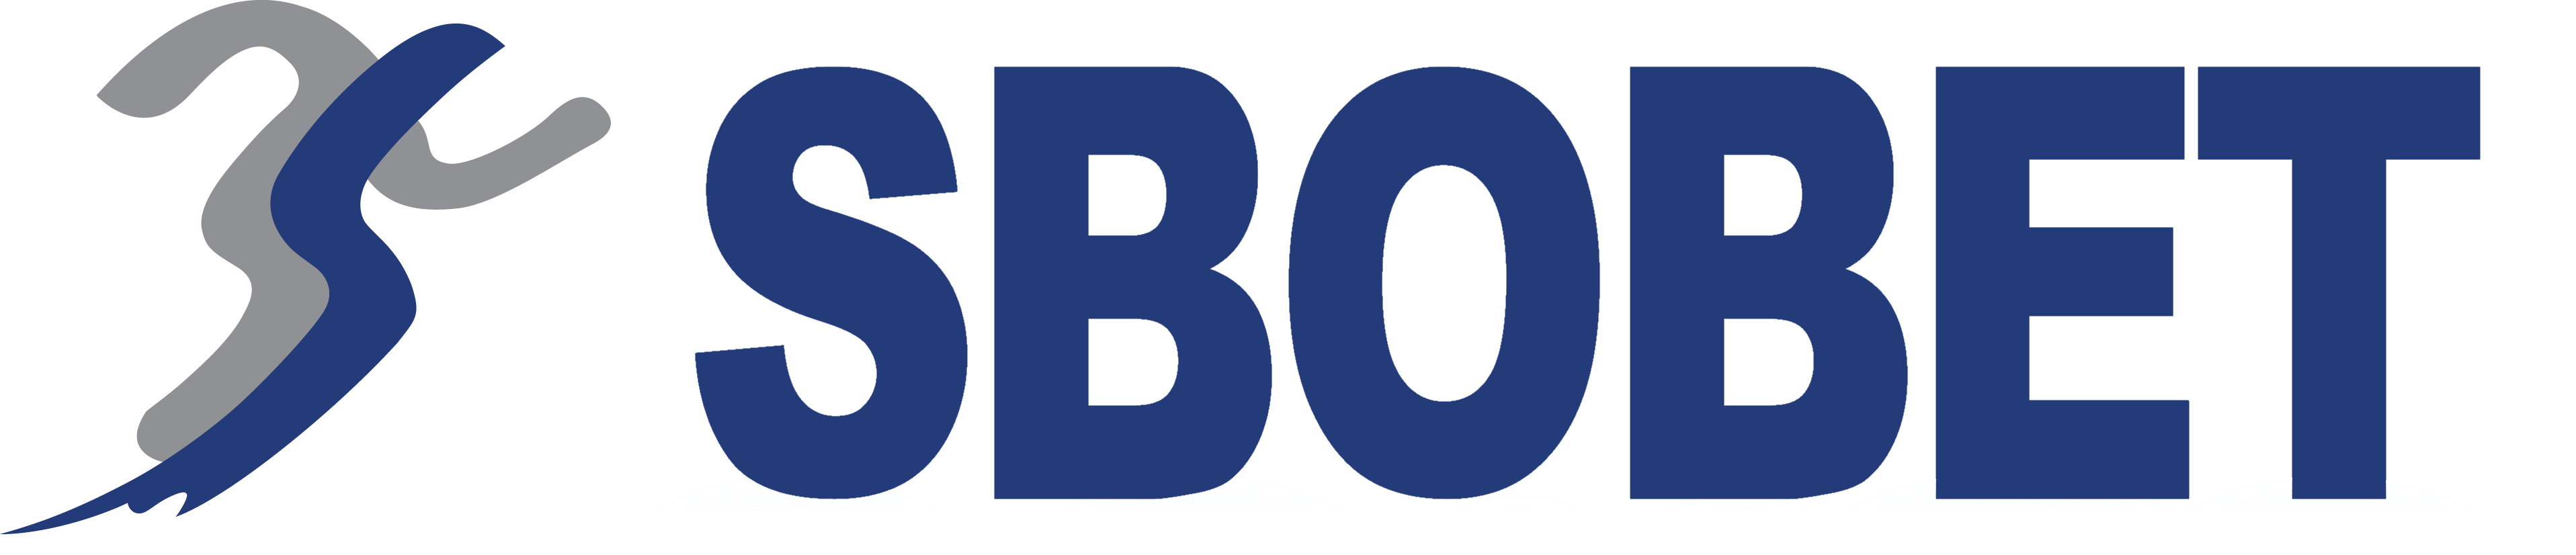 SBOBET.COM - BANDAR JUDI BOLA ONLINE TERPERCAYA - MACAU303.ID